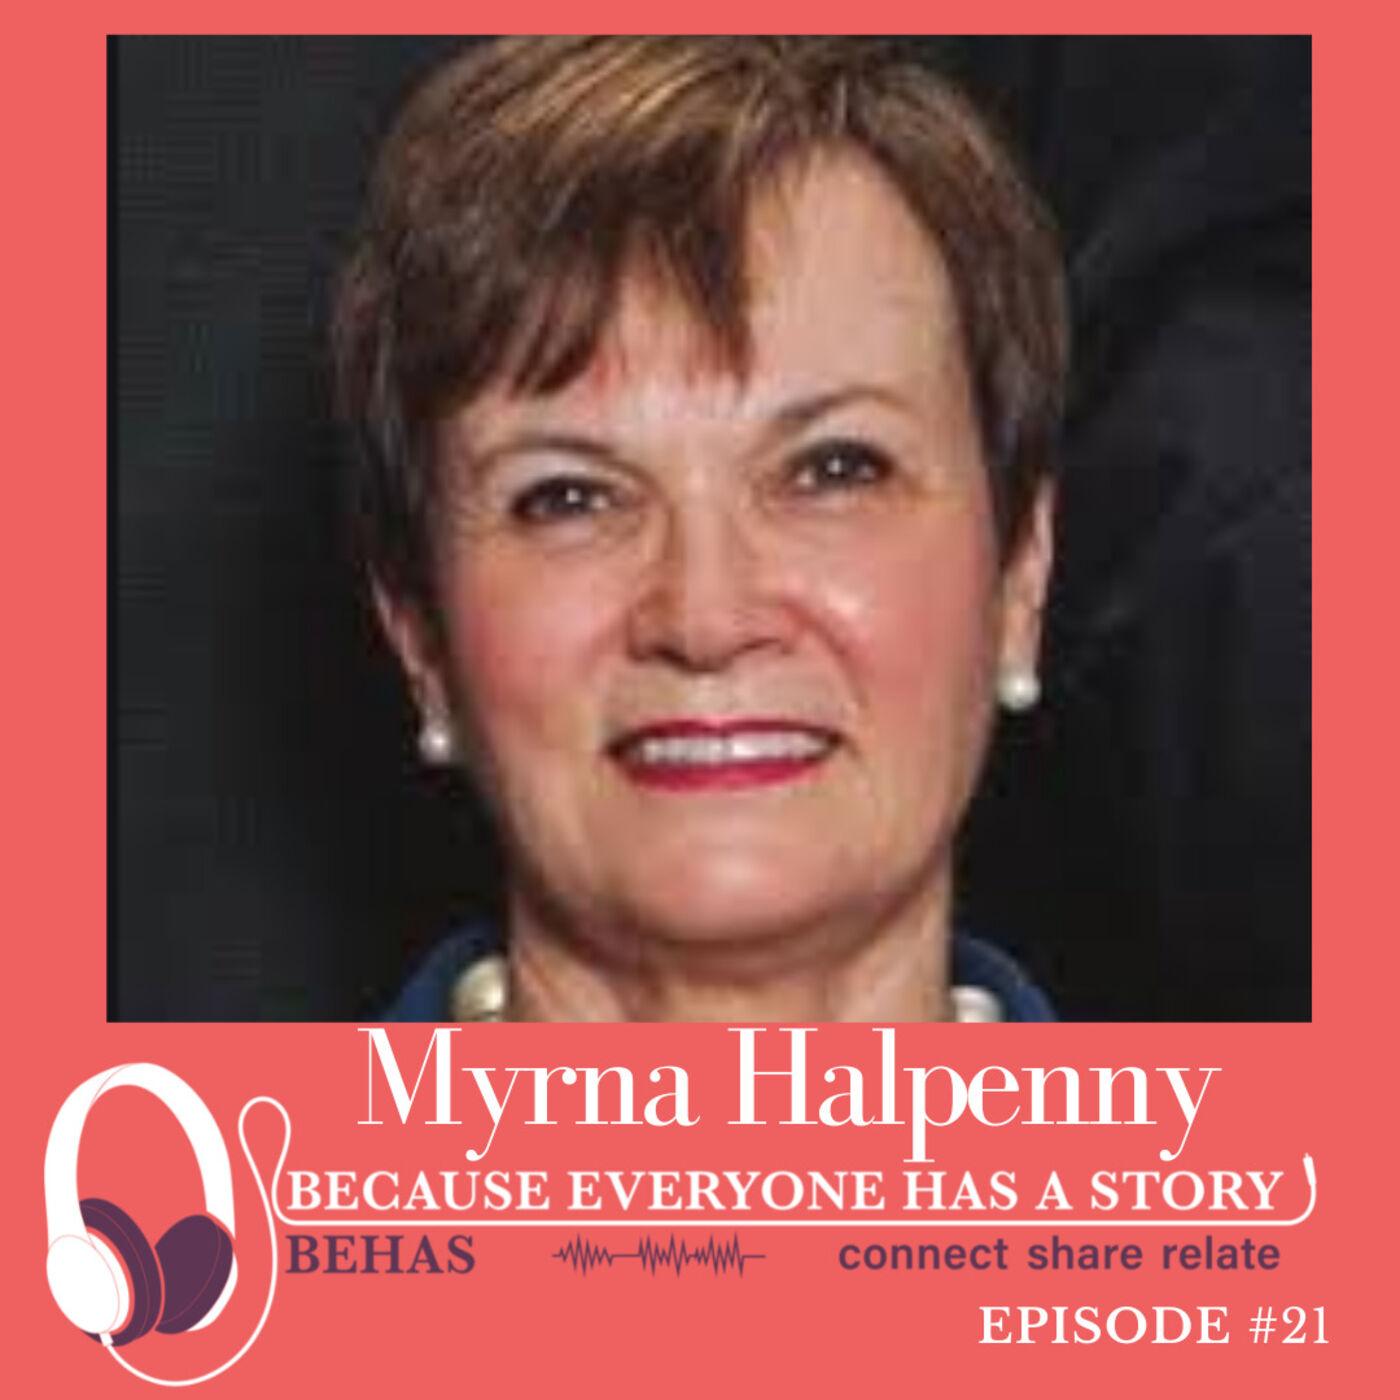 #22 - The Life Story of a Long Time Endodontist  - Myrna F. Halpenny